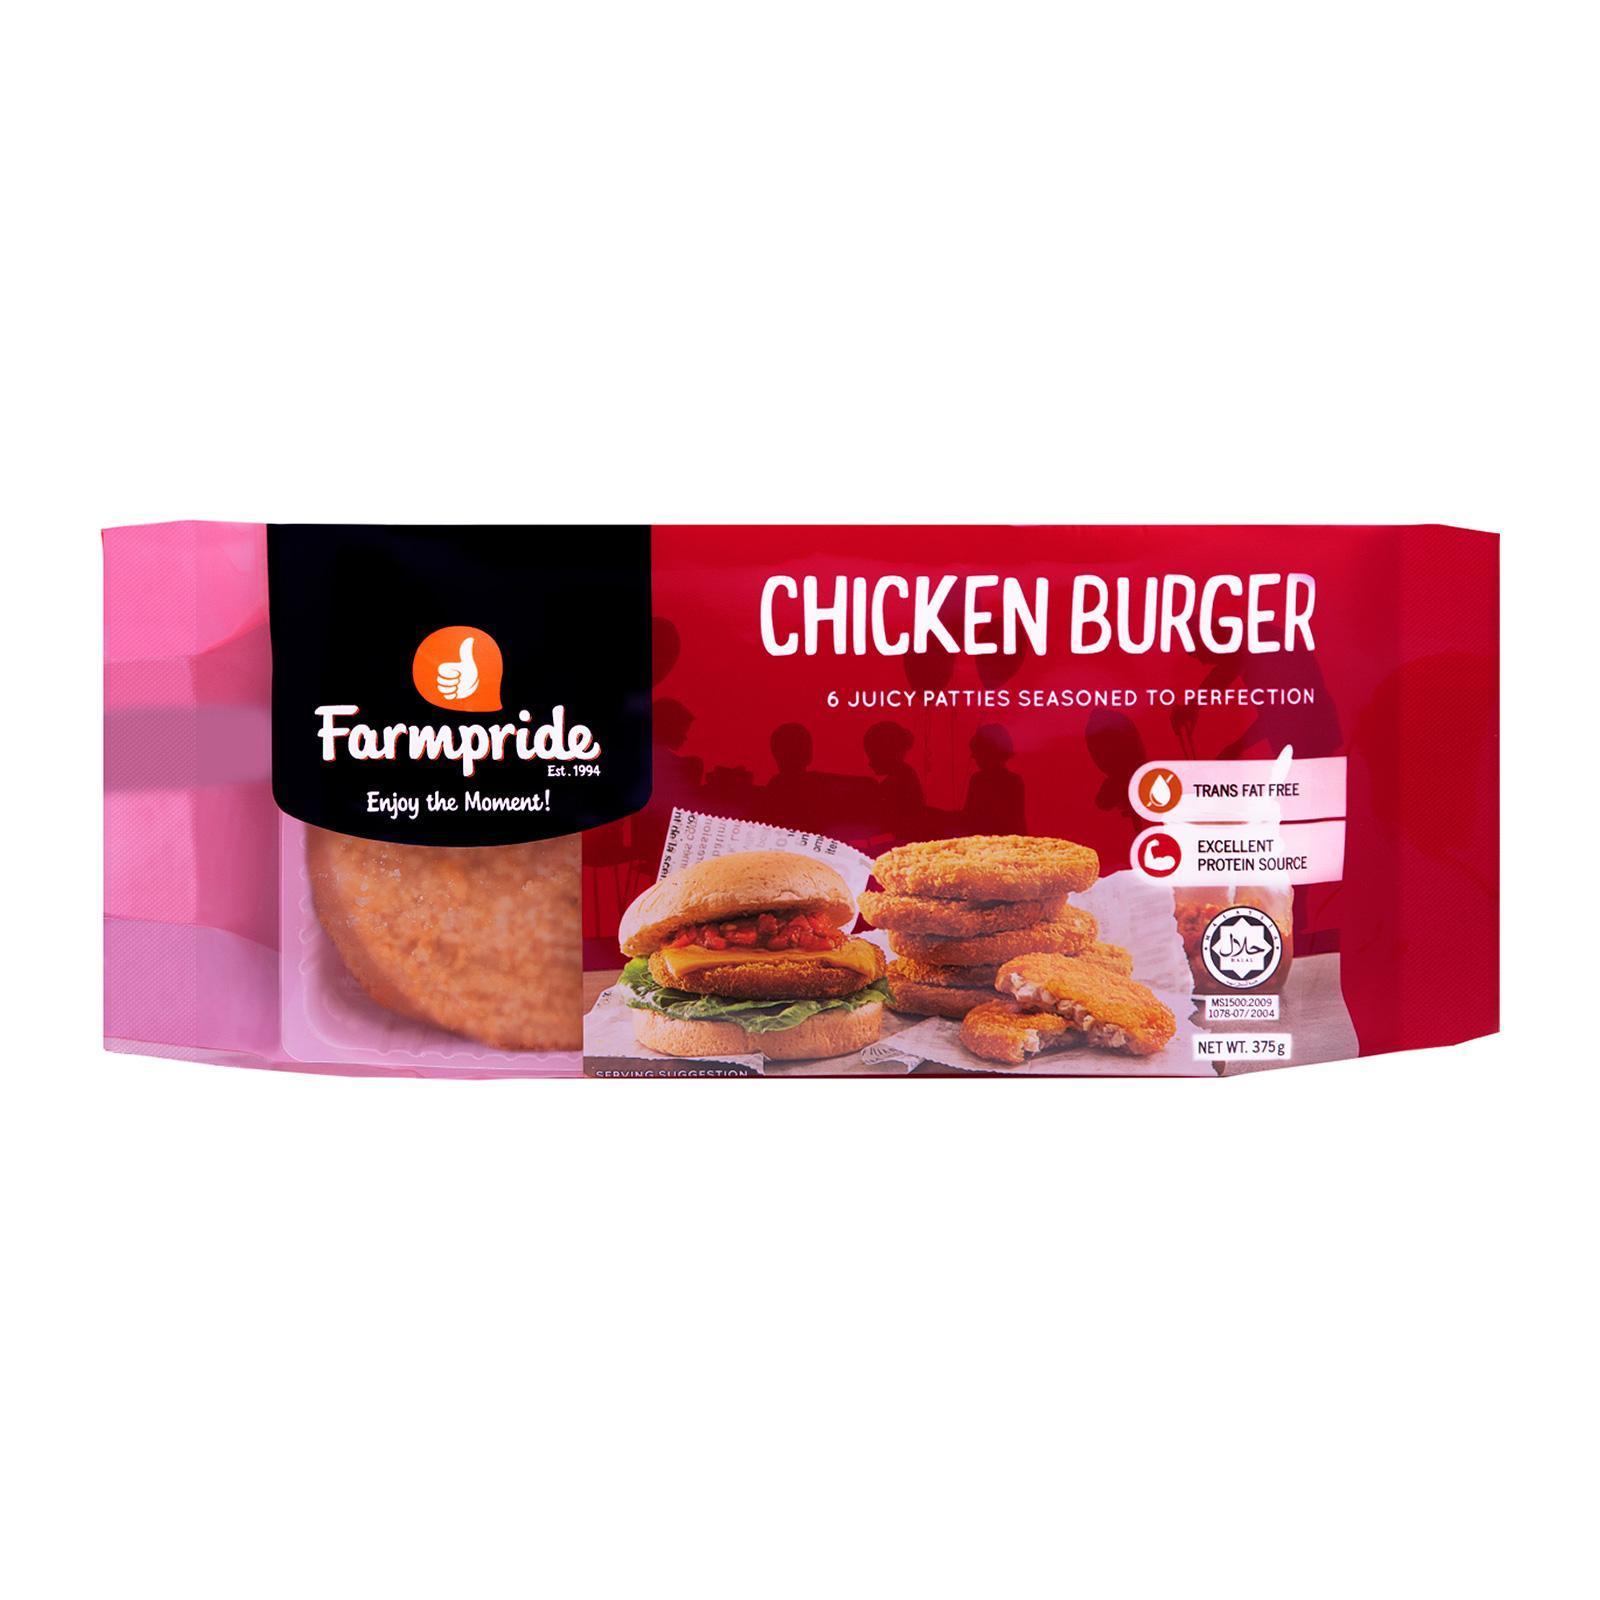 Farmpride Breaded Chicken Burger - Frozen